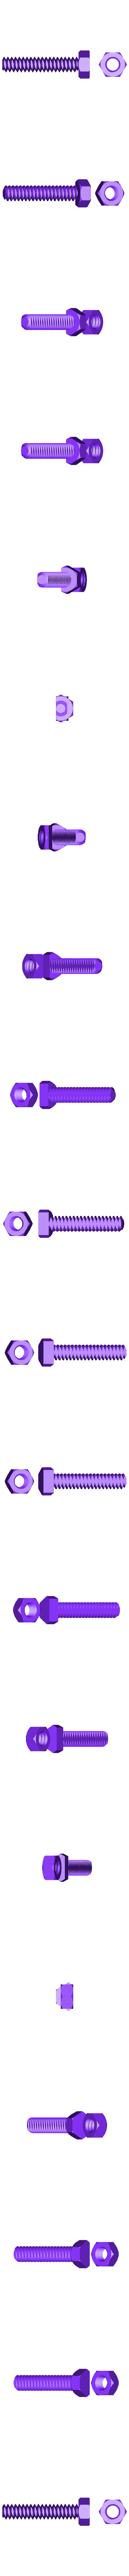 Clamp Bolt v2.stl Télécharger fichier STL gratuit LiftPod - Support pliable multifonctionnel • Objet à imprimer en 3D, HeyVye